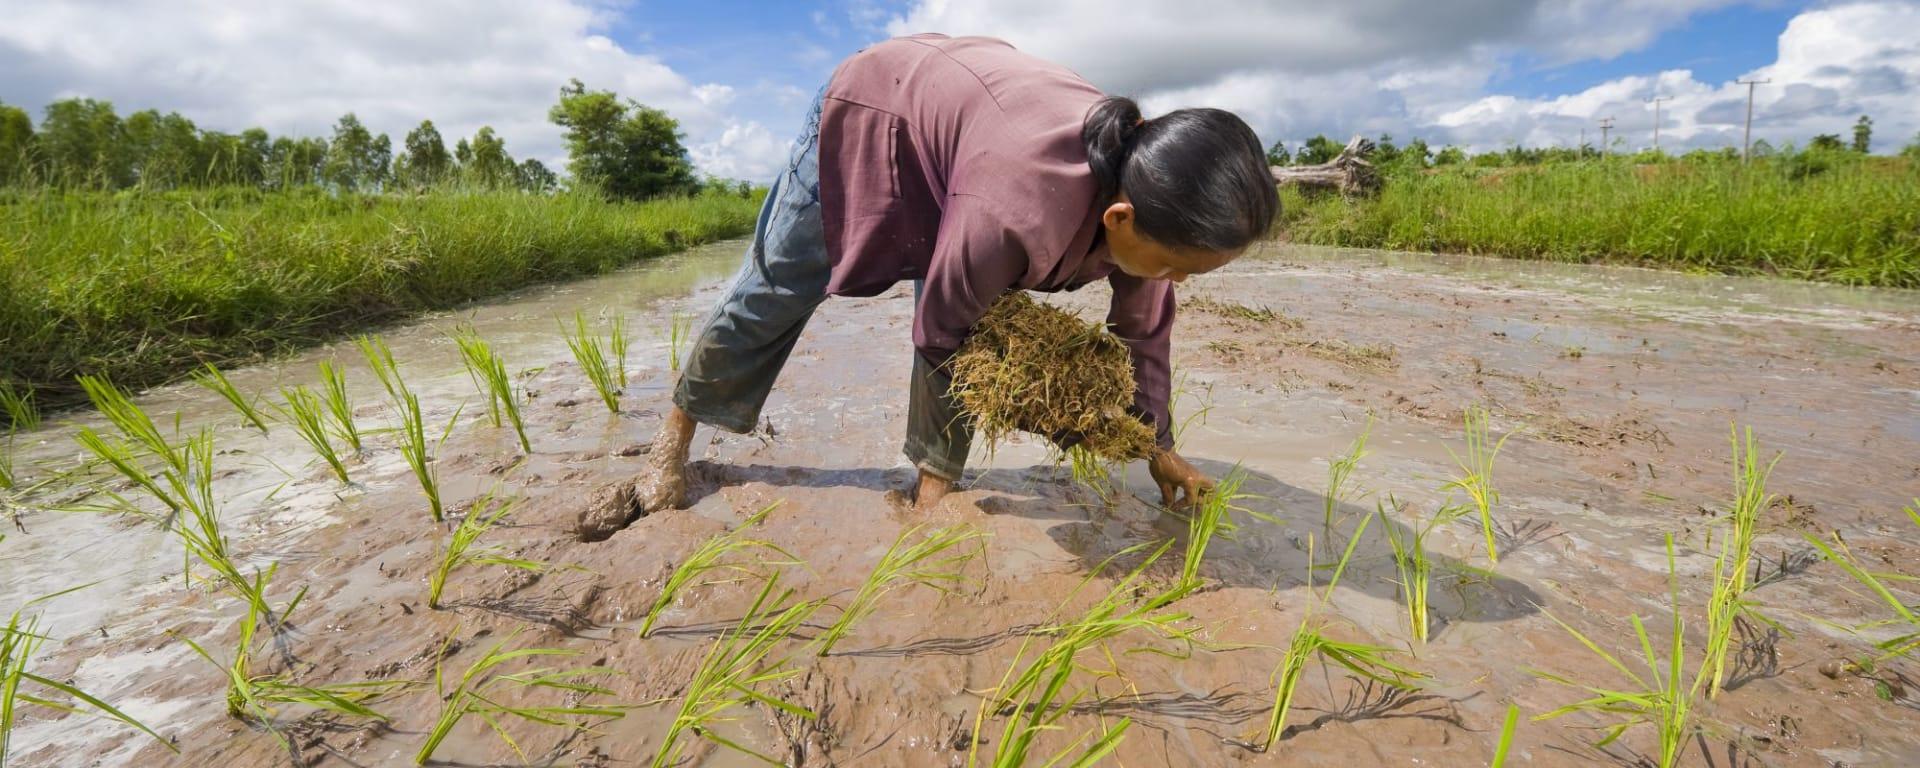 I-San - le trésor caché / BKK-Siem Reap de Bangkok: I-San: farmer planting rice